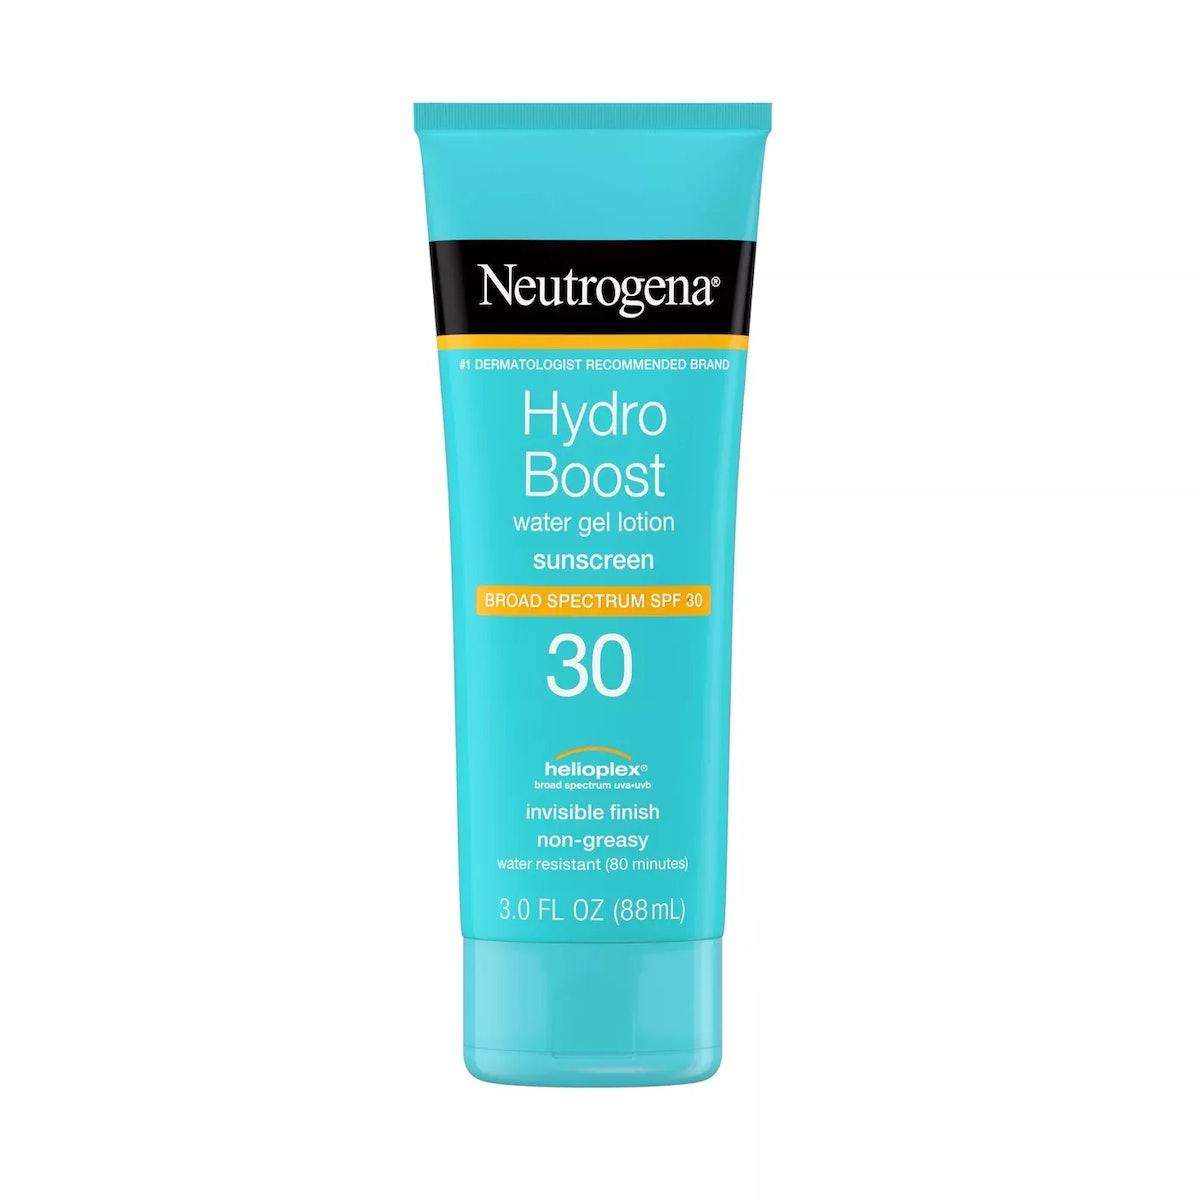 Neutrogena Hydro Boost Gel Moisturizing Sunscreen Lotion